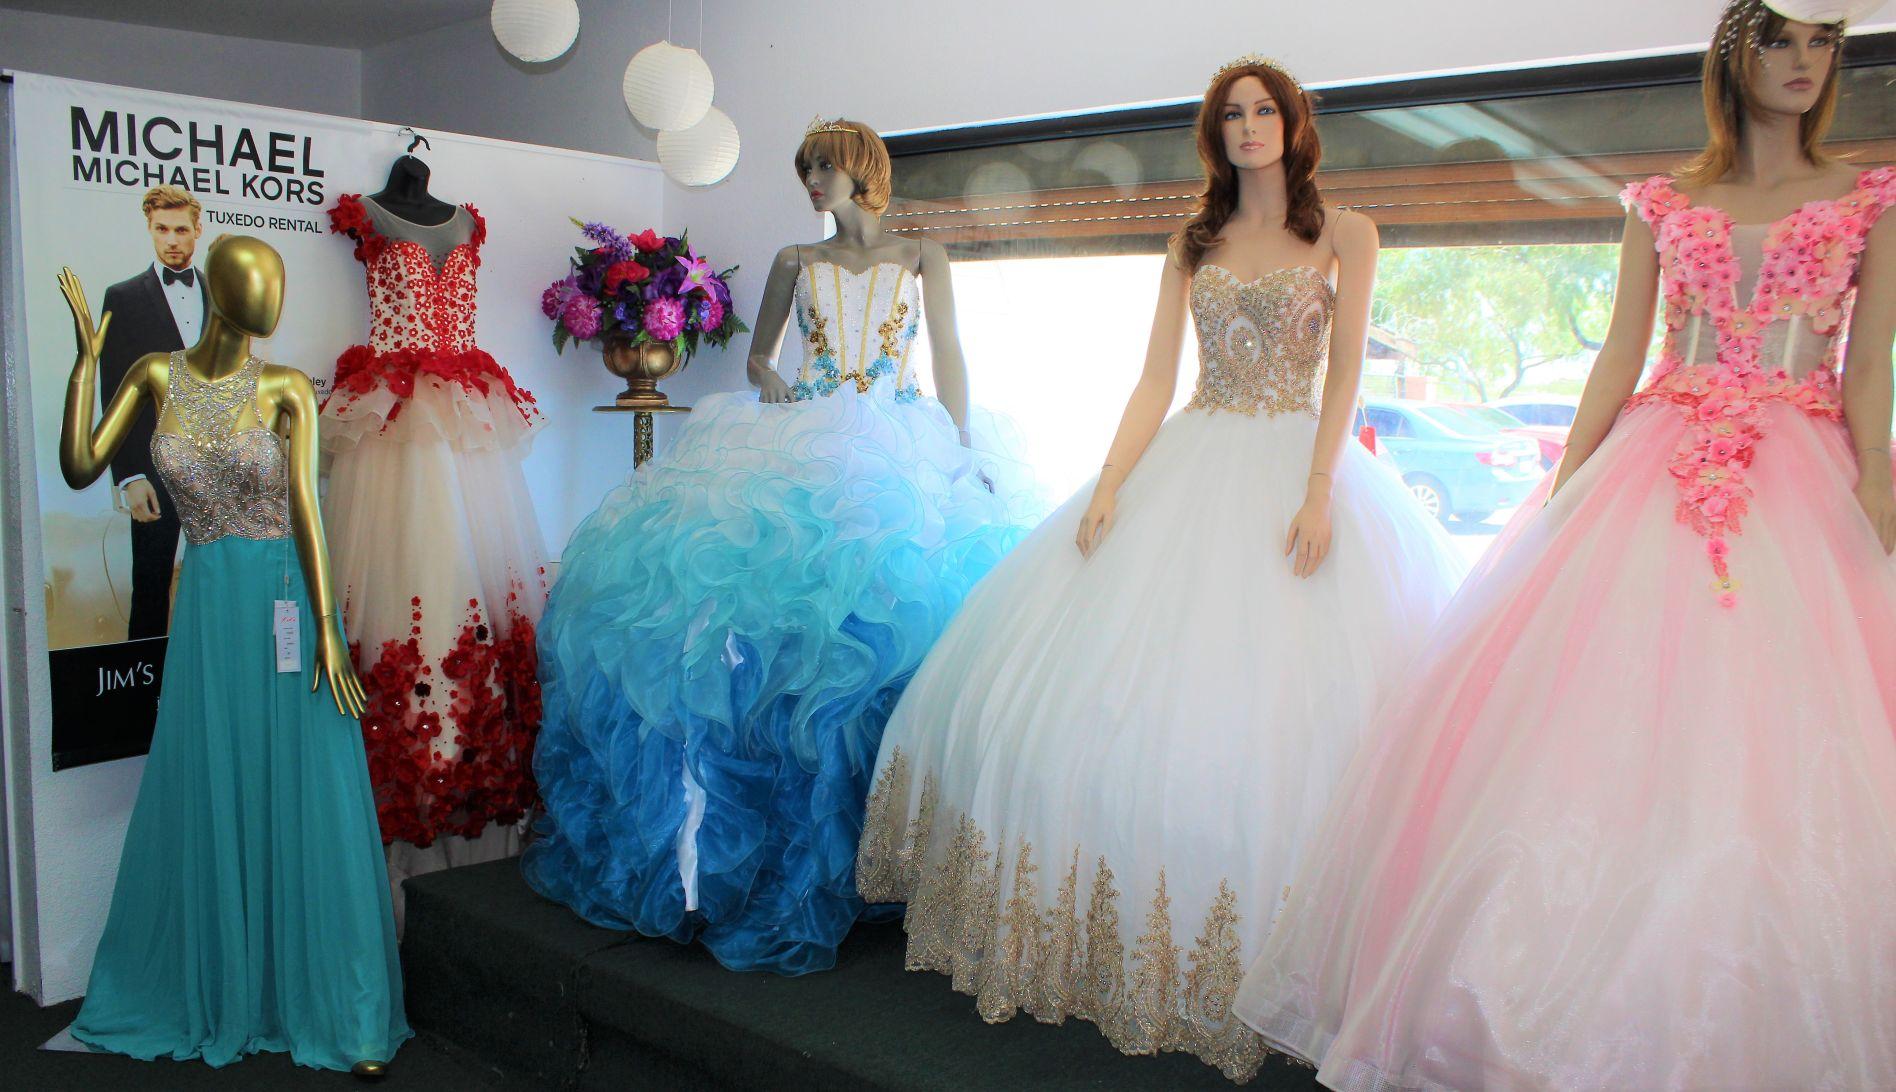 Dress Shops | Tucson Wedding Guide|Dress Shops | tucson.com